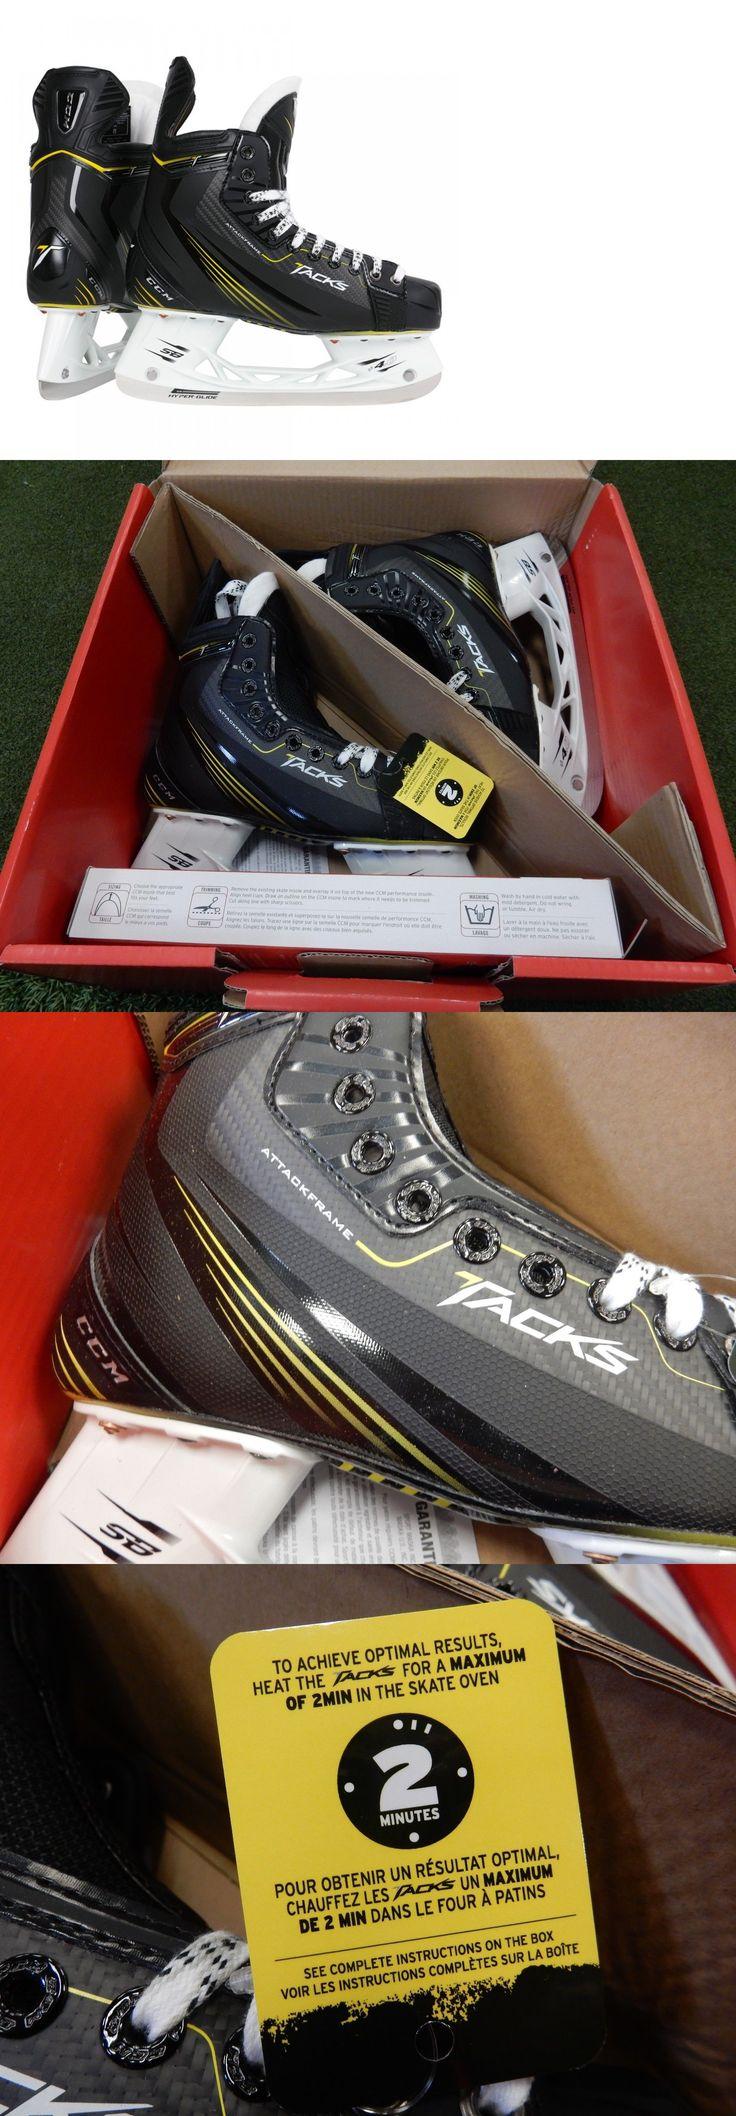 Ice Hockey-Adult 20858: New In Box! Ccm Tacks Senior Hockey Skates - Size 7 D *Retail: $800* BUY IT NOW ONLY: $499.95